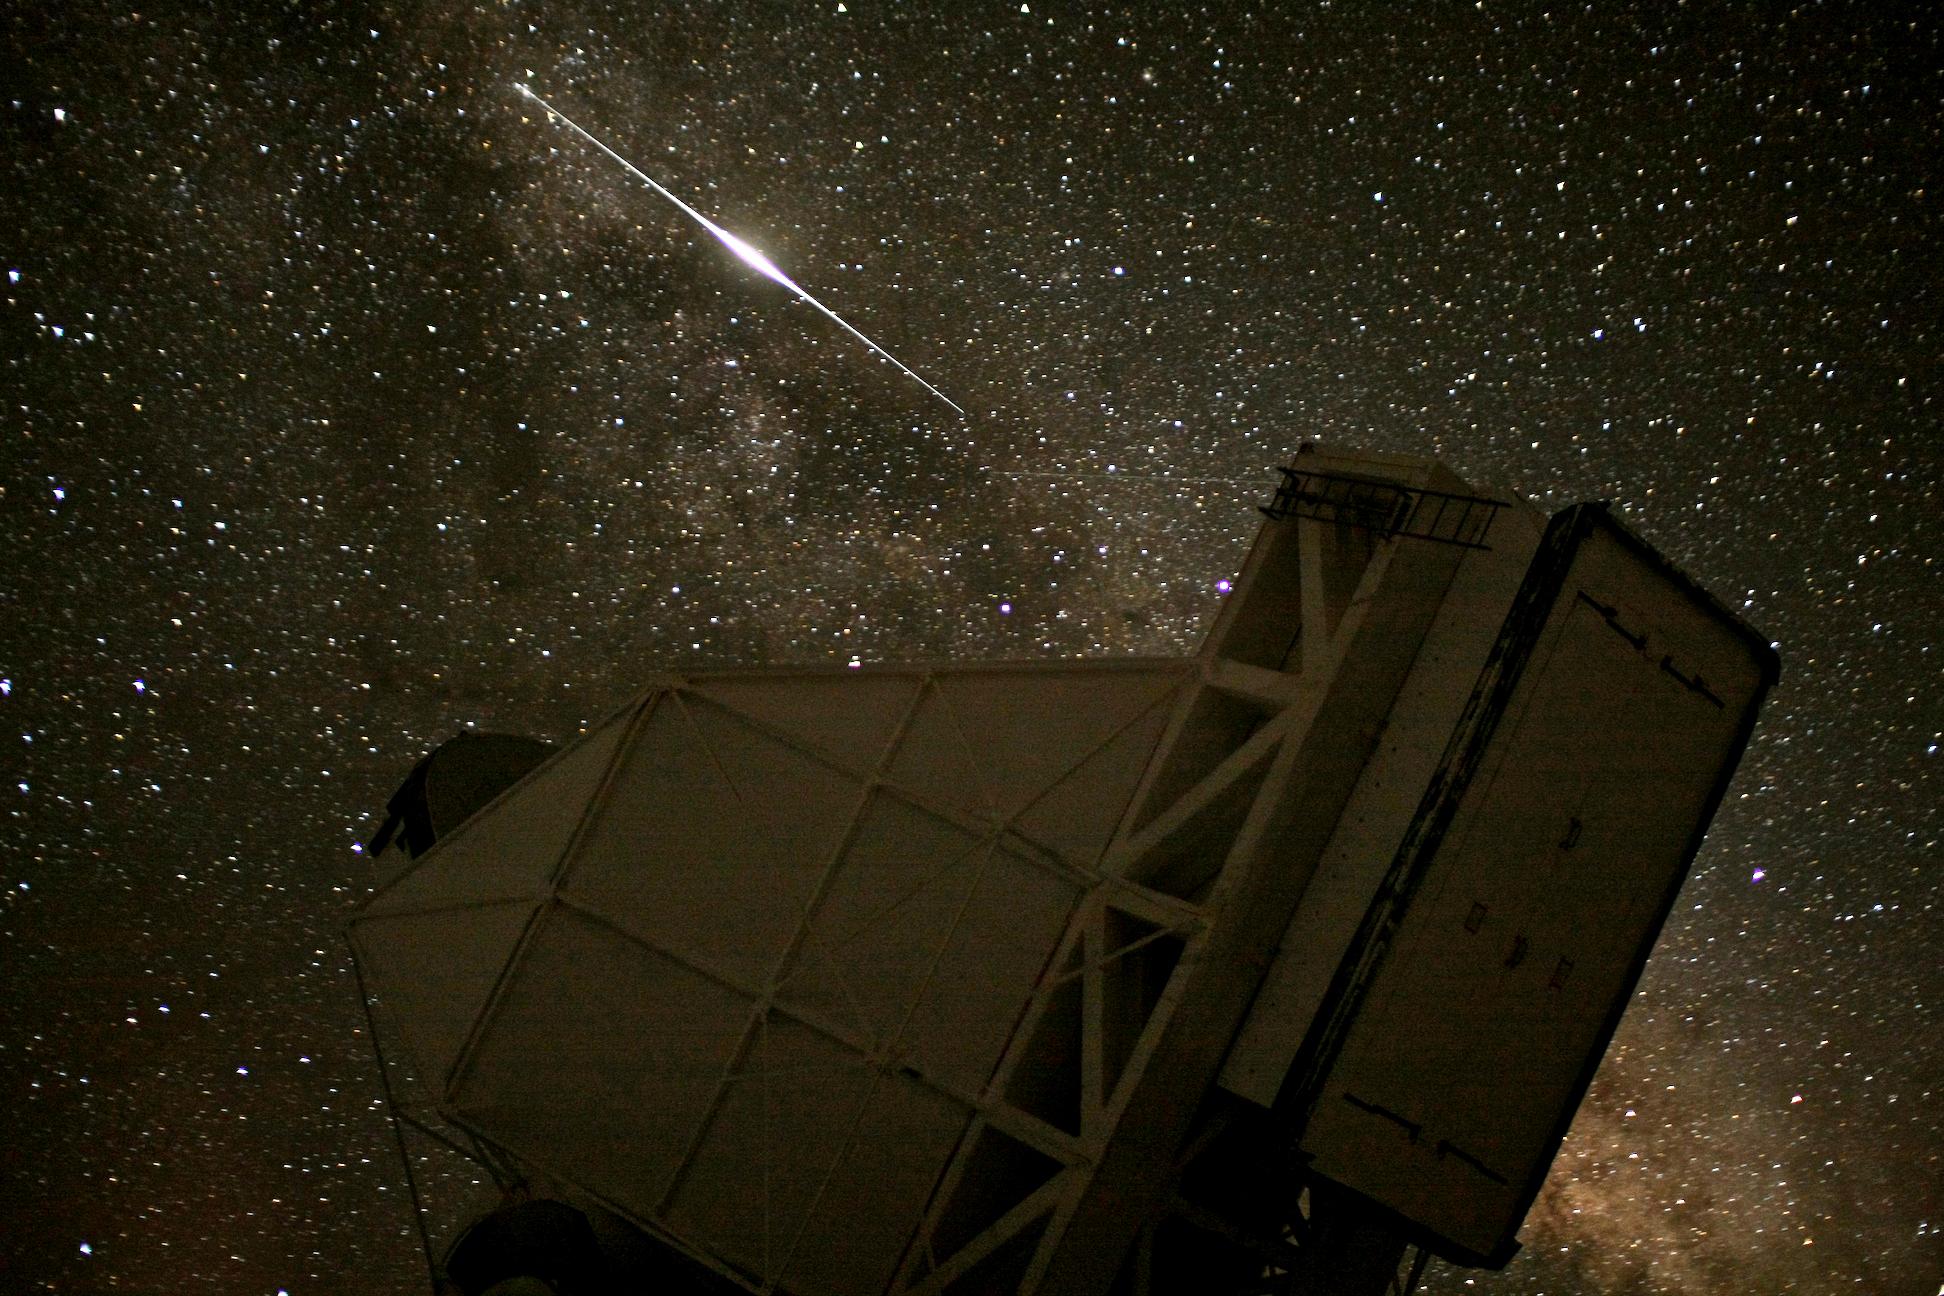 Multimedia Gallery - Iridium flare over telescope | NSF